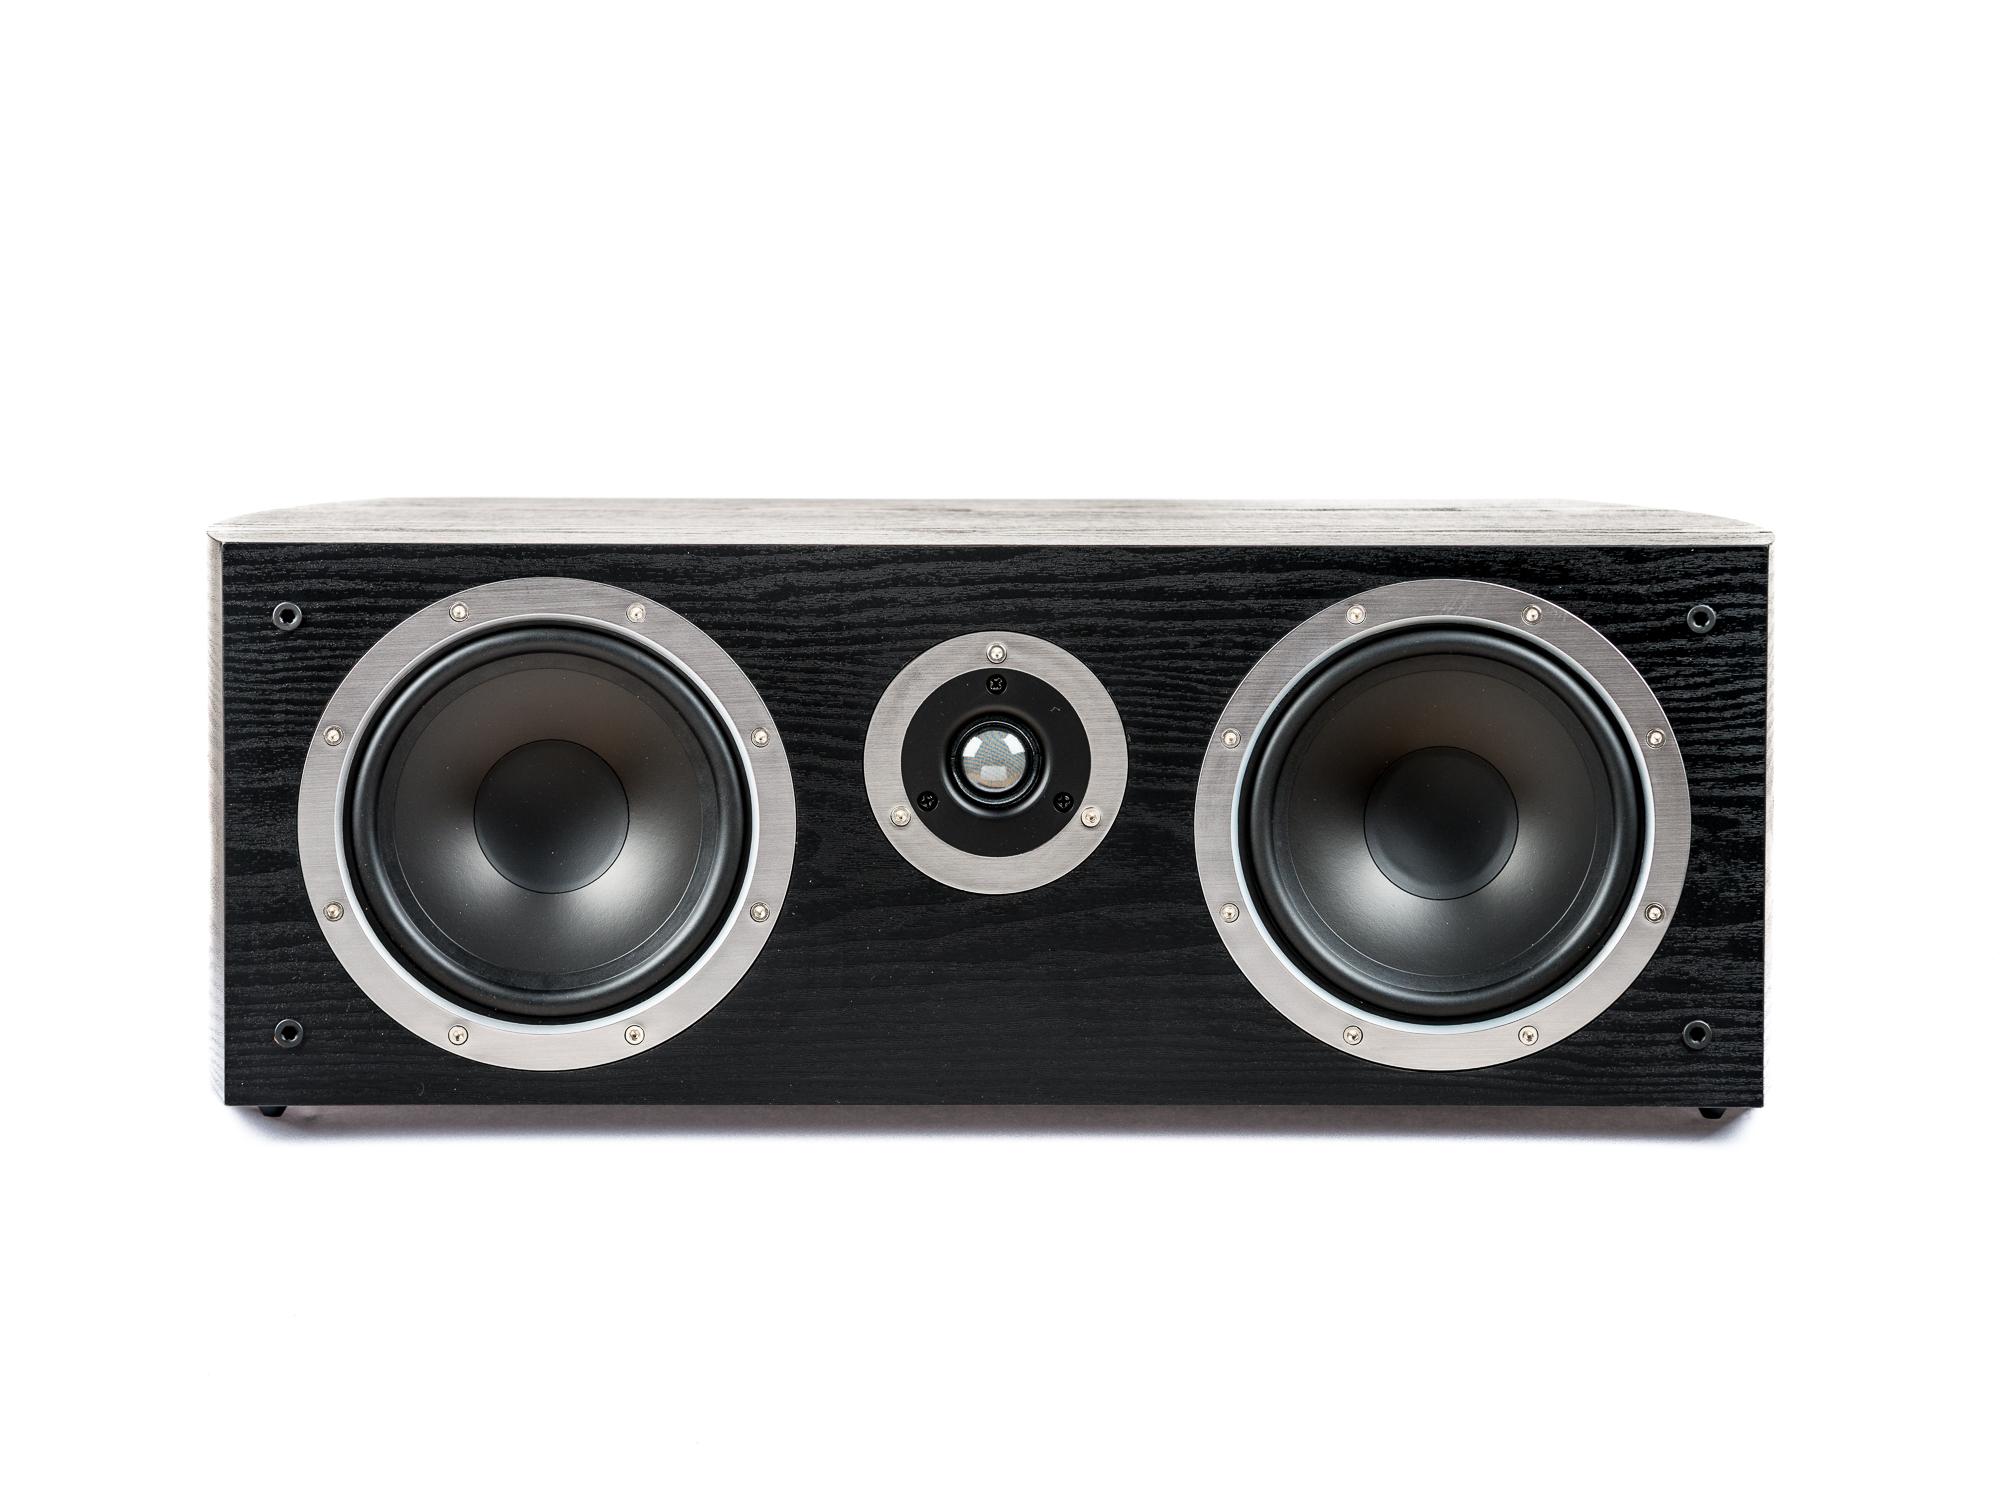 PG Audio universeller XL Center Lautsprecher, 2 Wege Bassreflex, schwarz, Neu-Ware – Bild 1